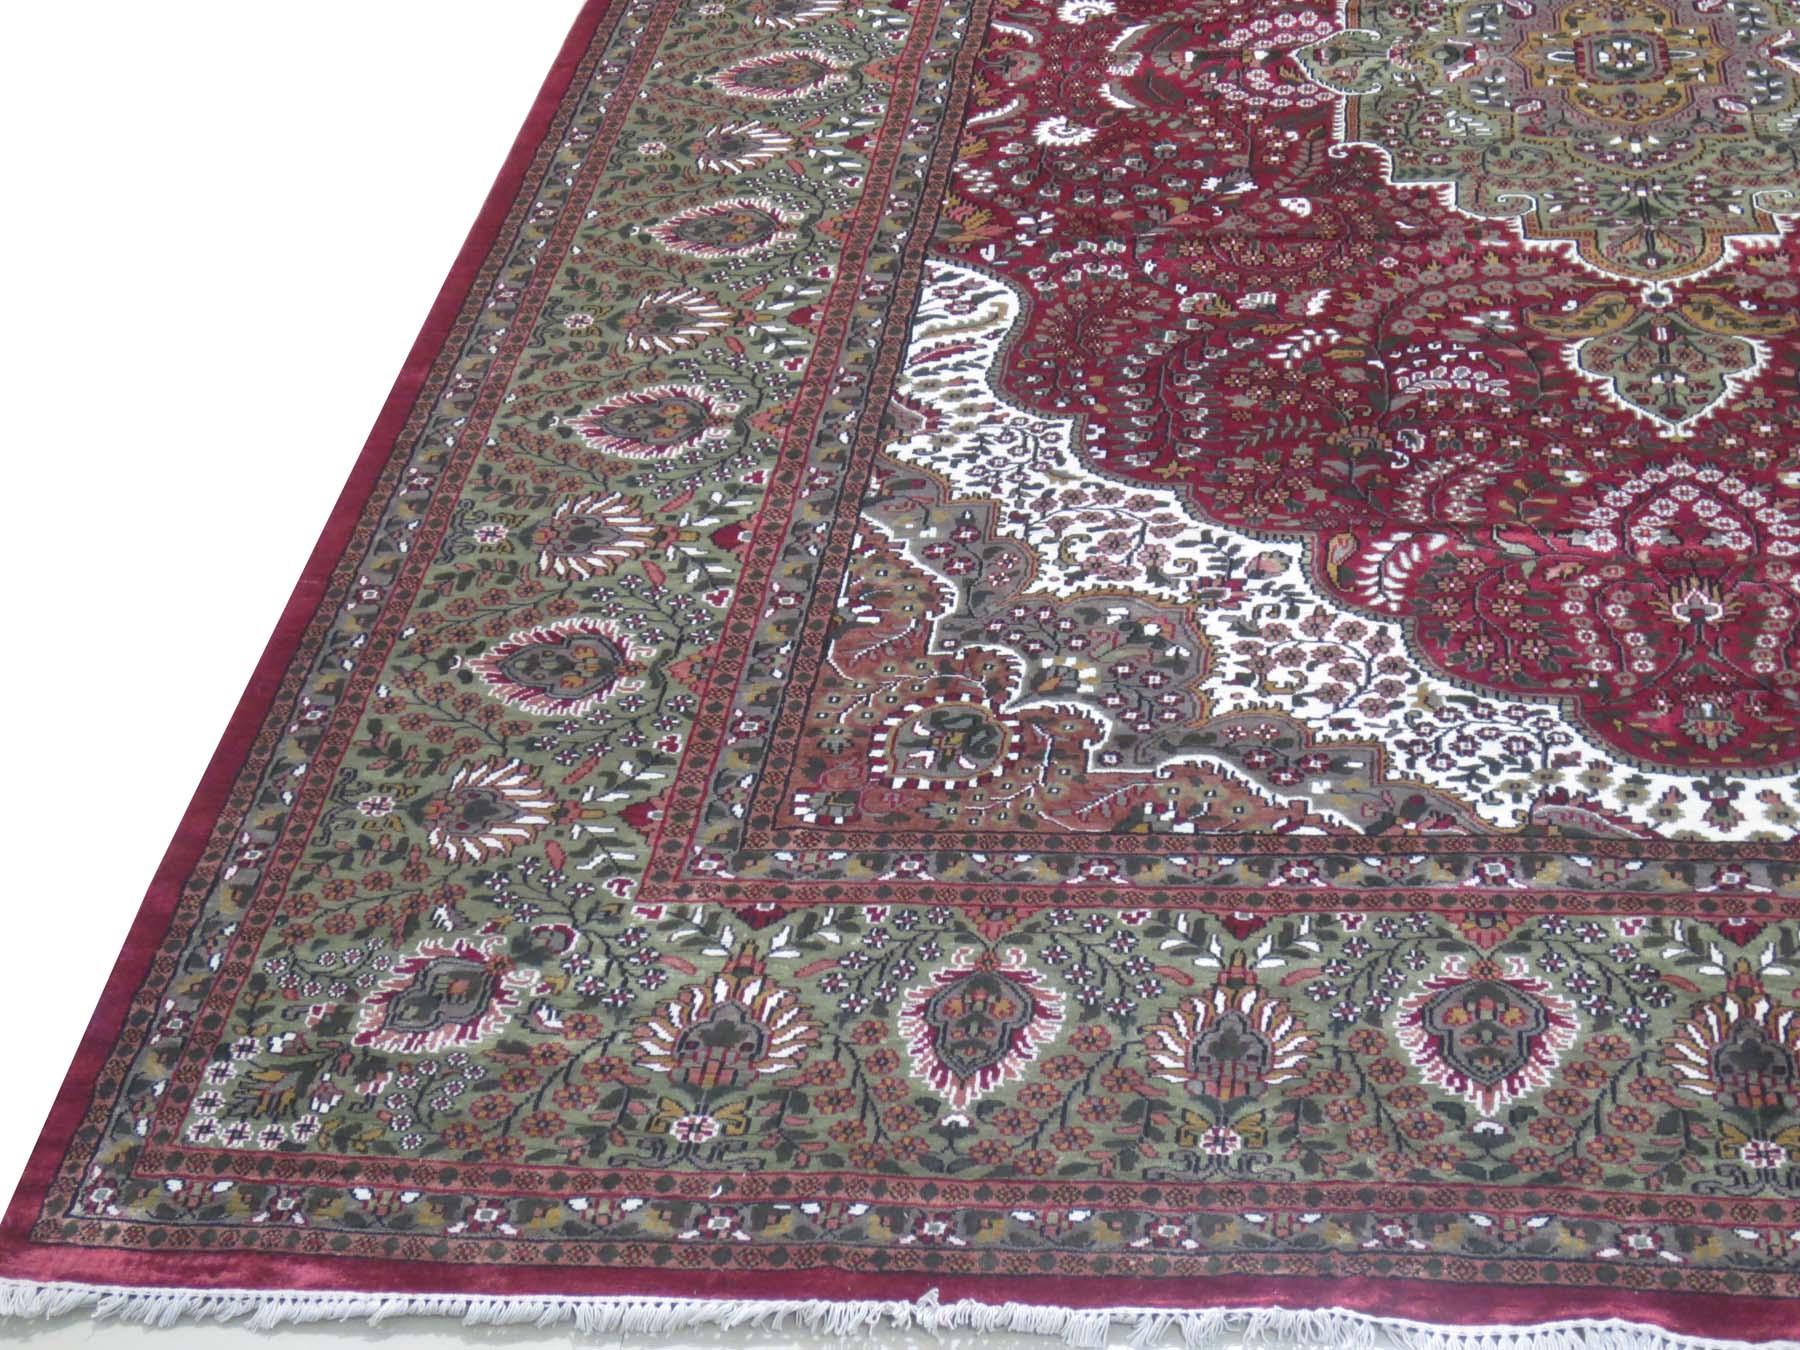 burgundy kashmir bamboo silk rugs handmade rug 10 x 15 persian design carpet. Black Bedroom Furniture Sets. Home Design Ideas